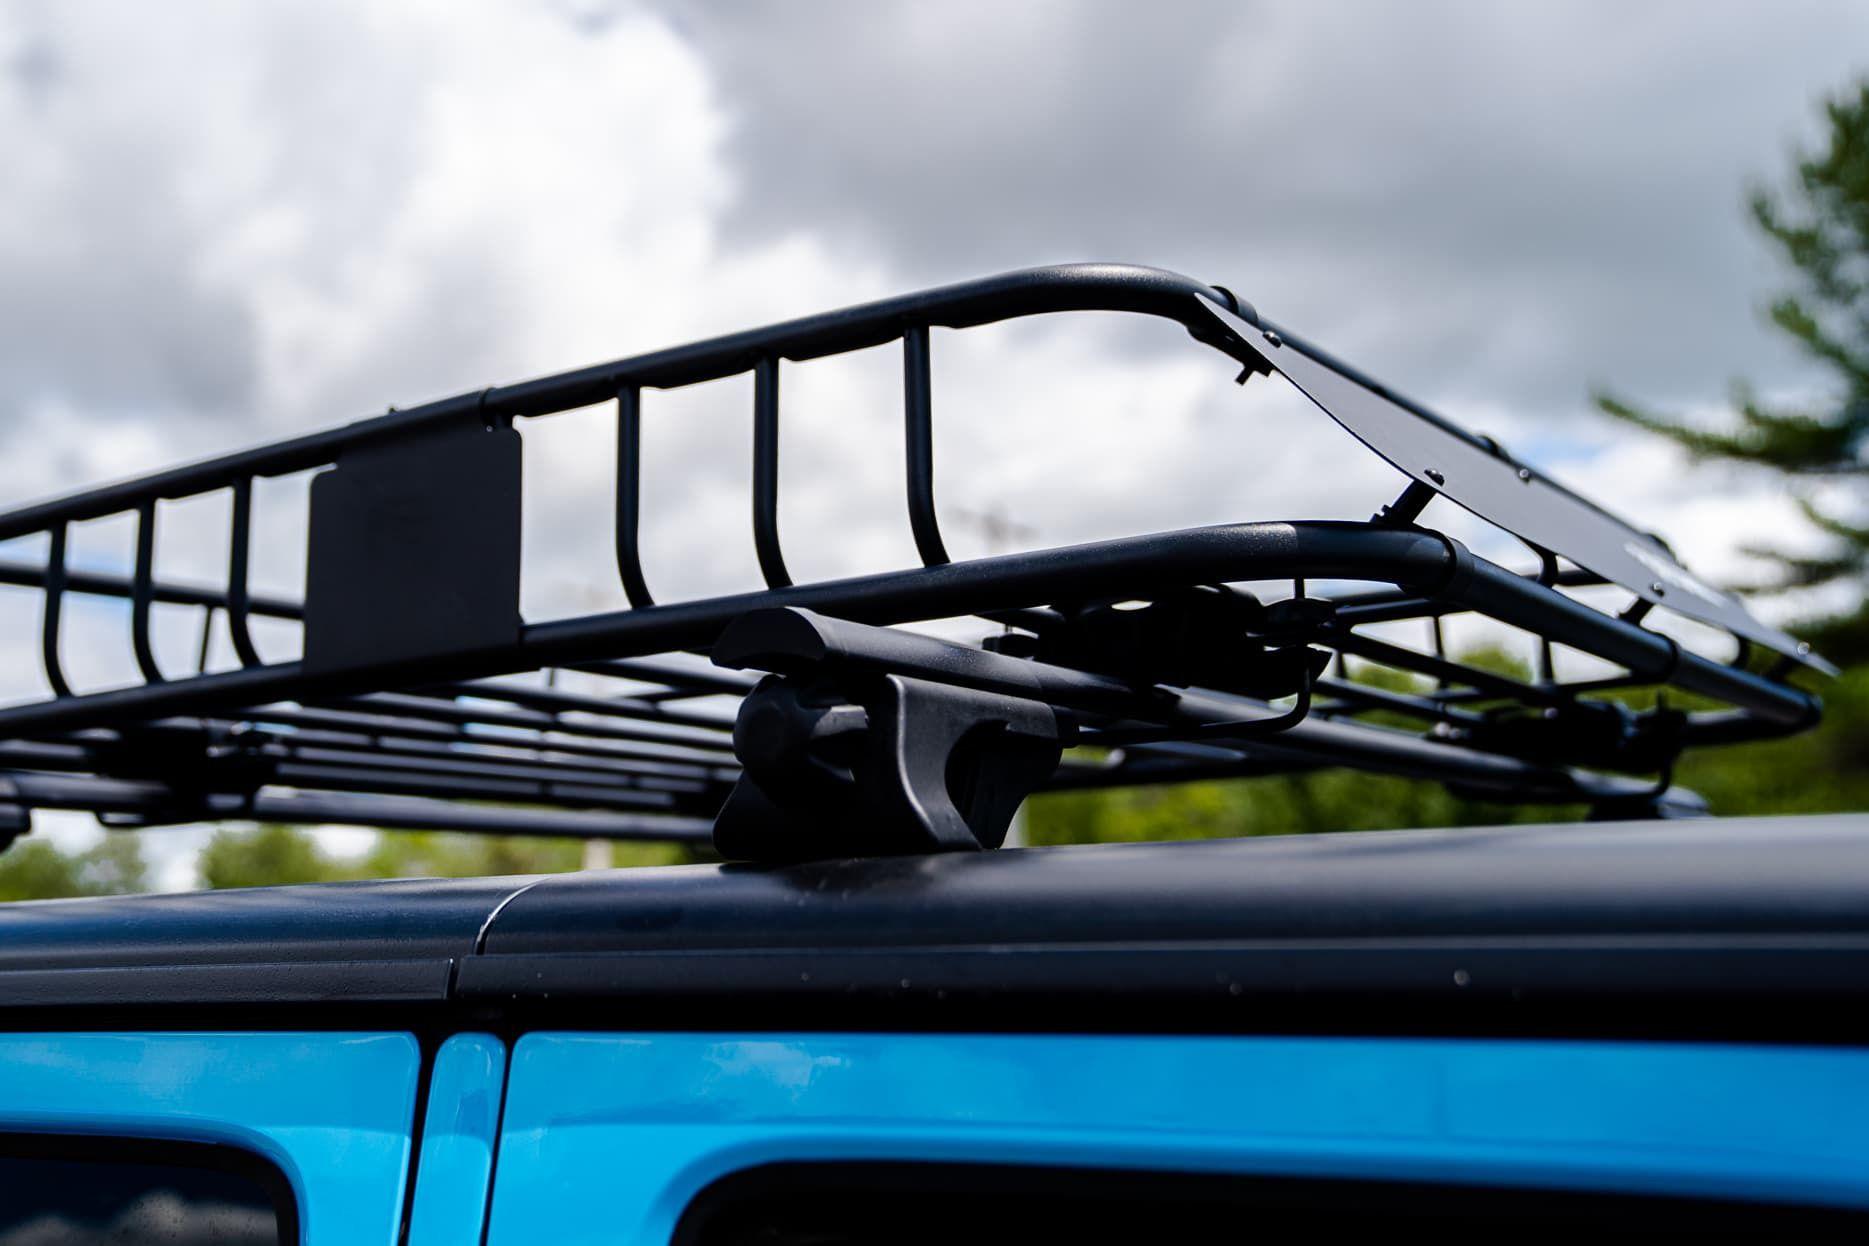 Ouw Linex Jeepupgrades Blogphoto August 2